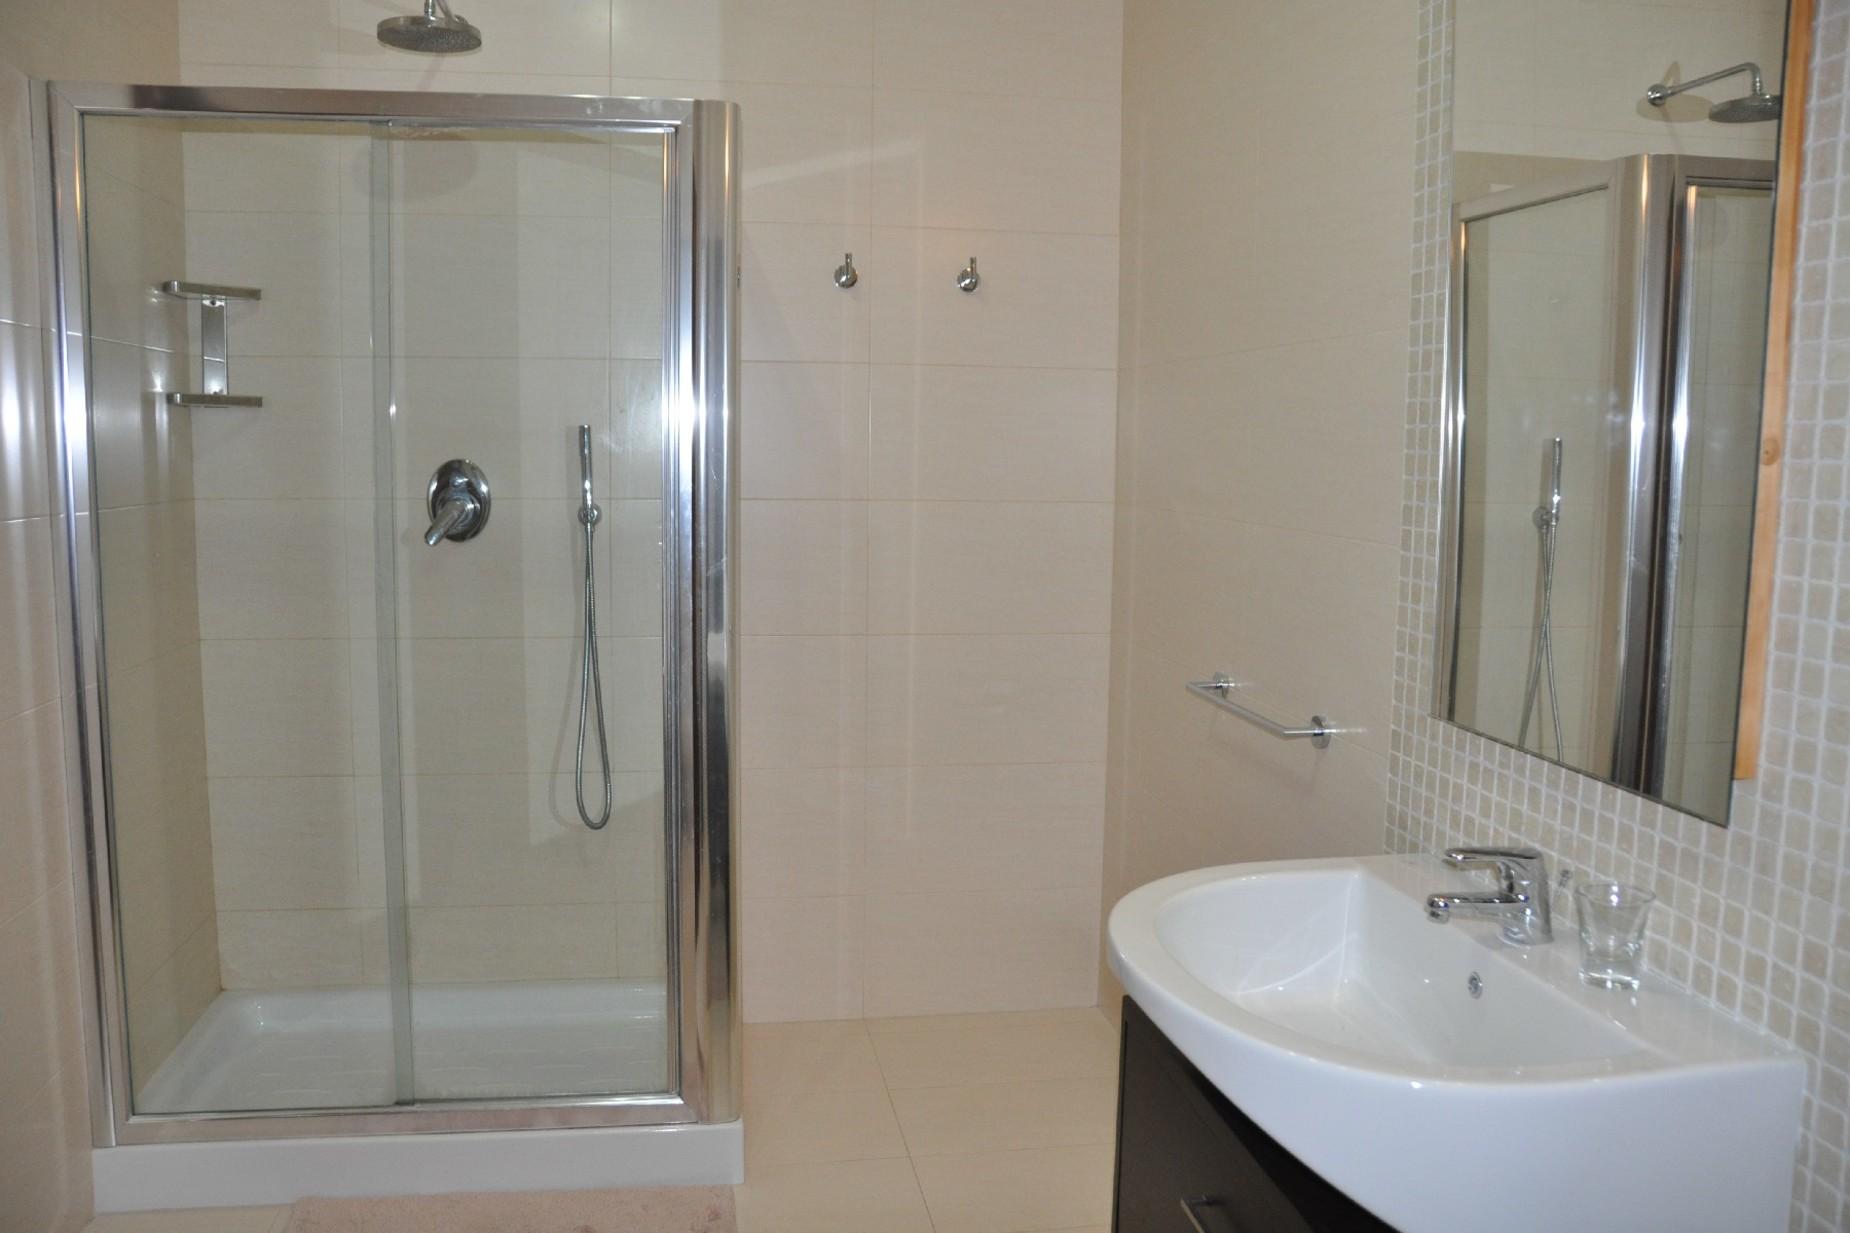 3 bed Apartment For Rent in Sliema, Sliema - thumb 11